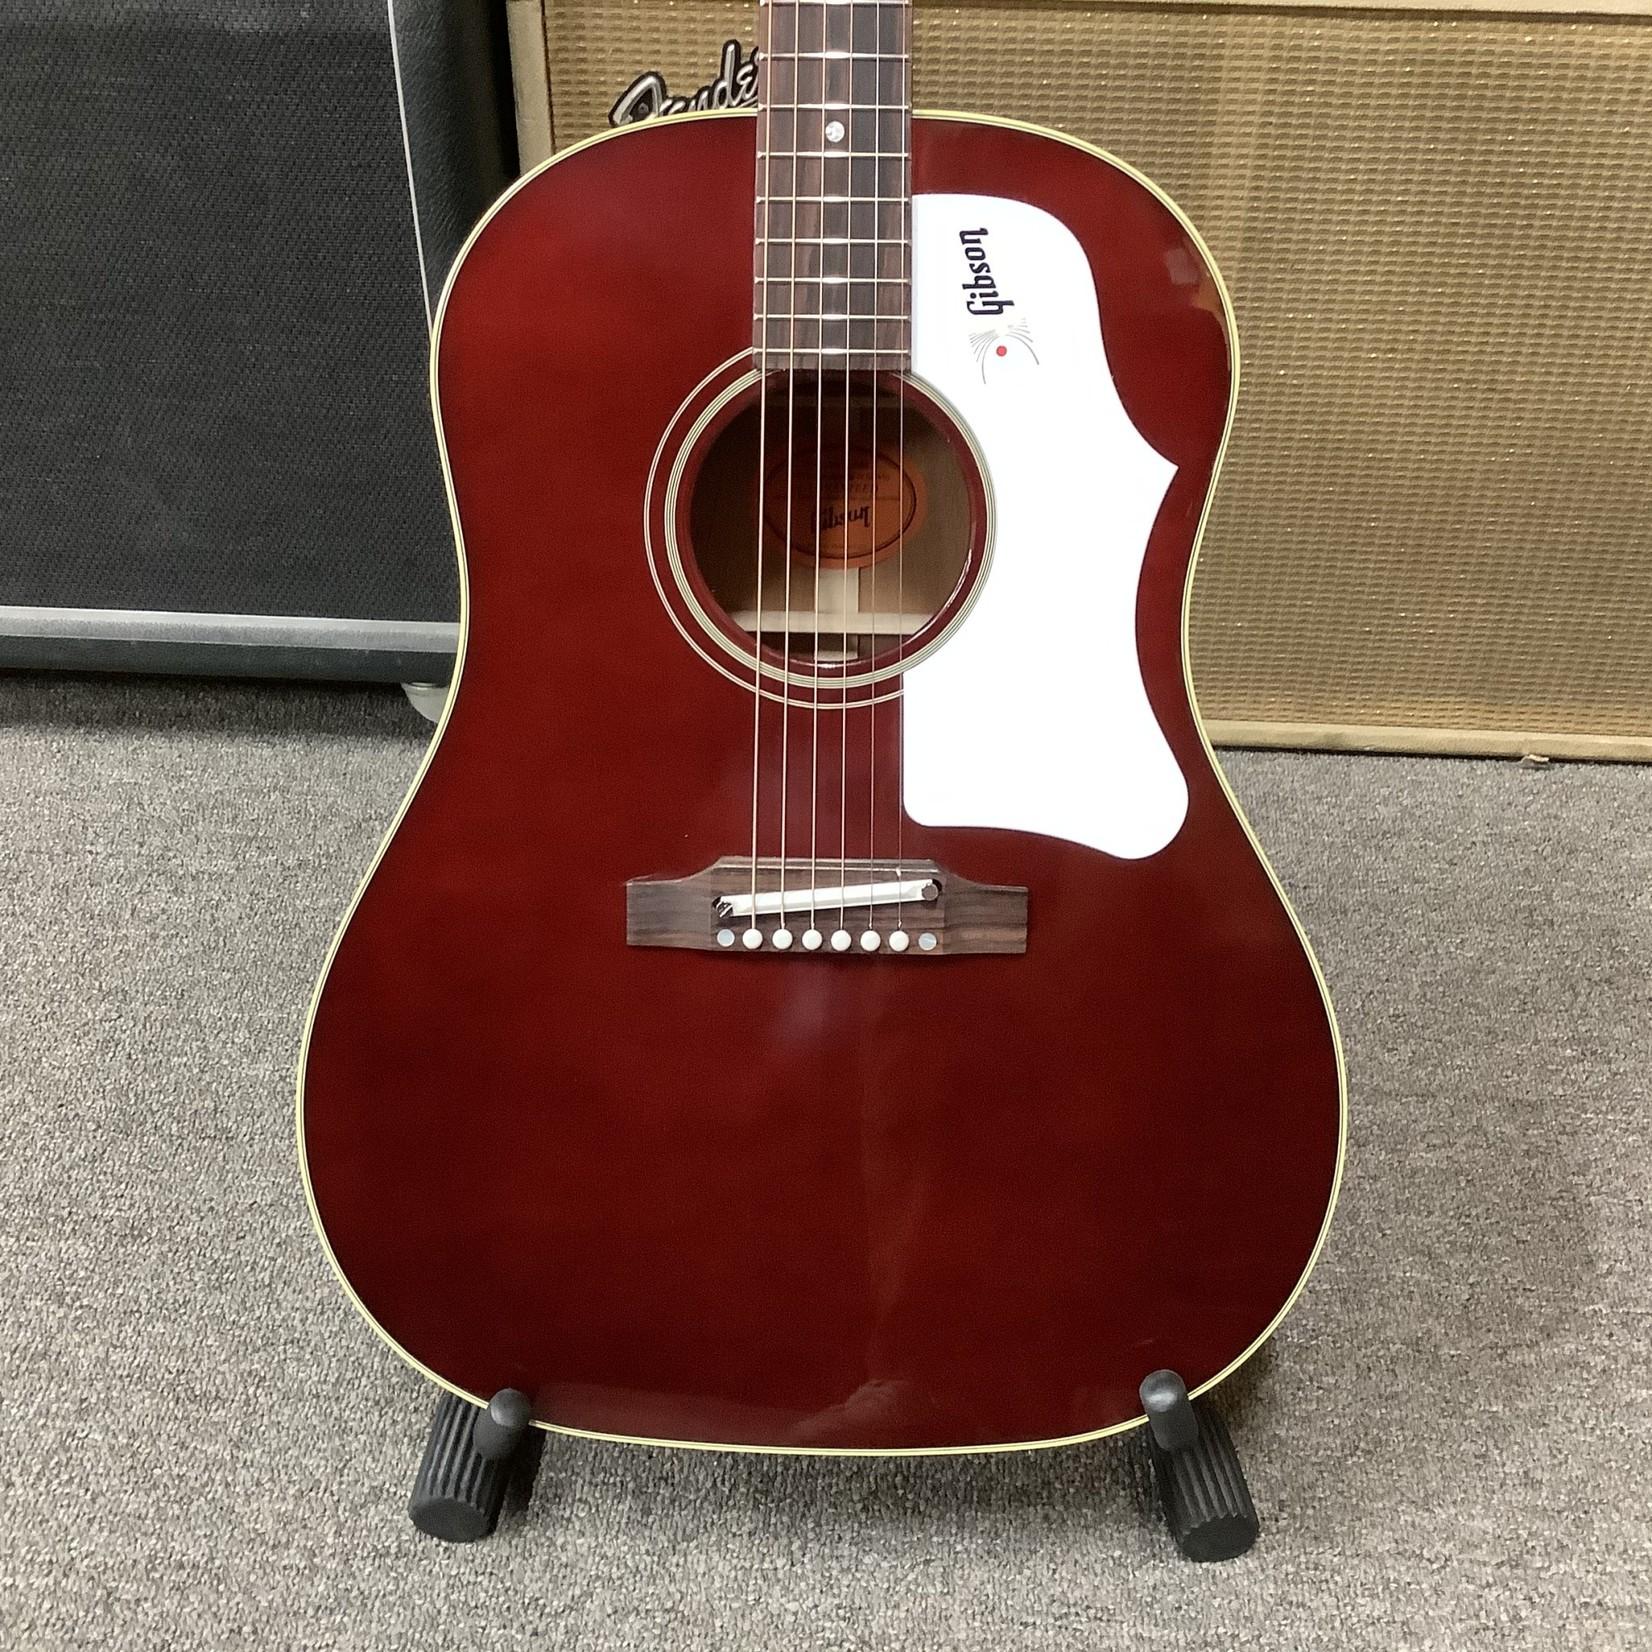 Gibson Brand New 2021 Gibson J-45 with Adjustable Bridge Saddle, Wine Red